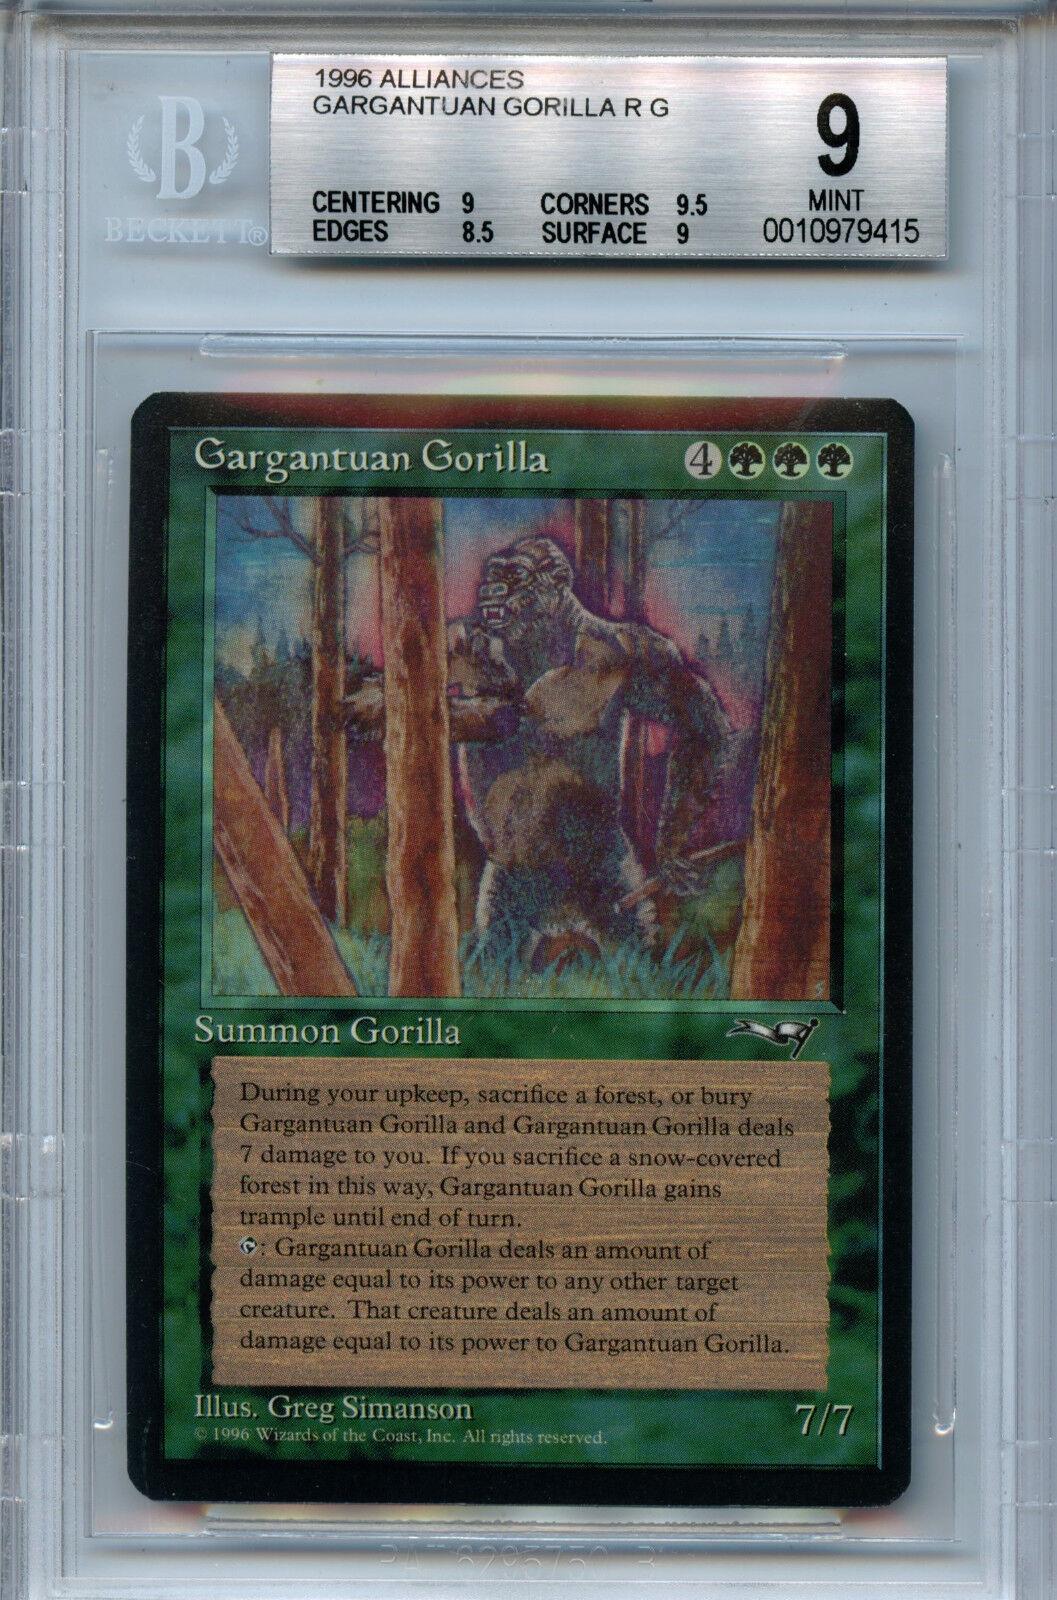 Mtg gorilas BGS 9.0 (9) menta Union Magic CocheDS amricons 9415